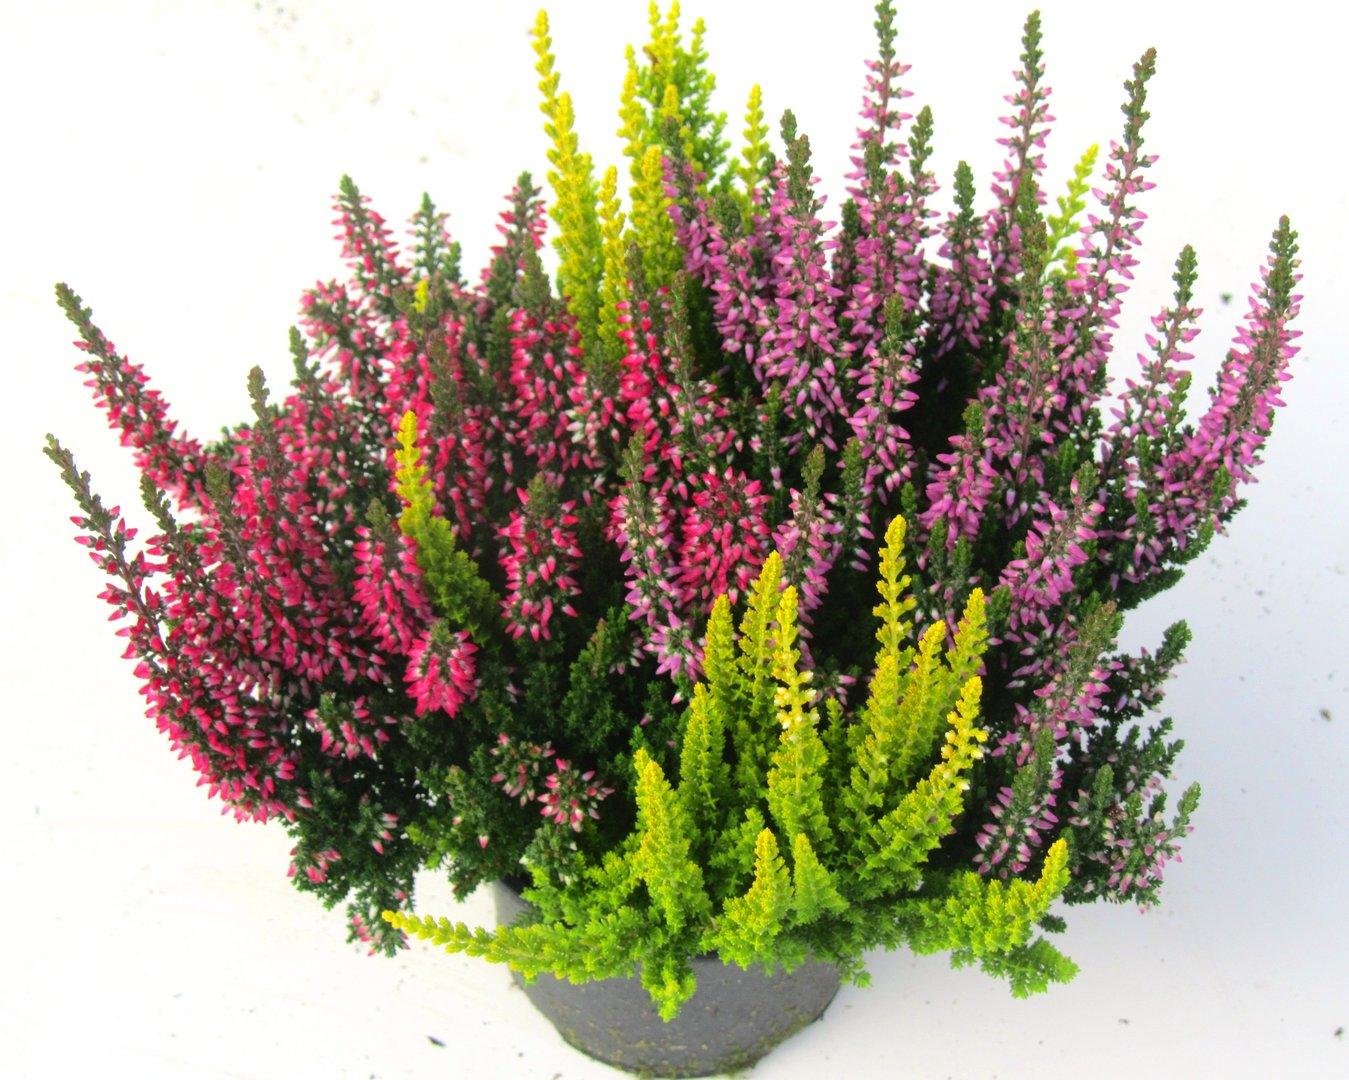 calluna vulgaris besenheide heidekraut trio 9 cm topf pflanzen versand f r die besten. Black Bedroom Furniture Sets. Home Design Ideas